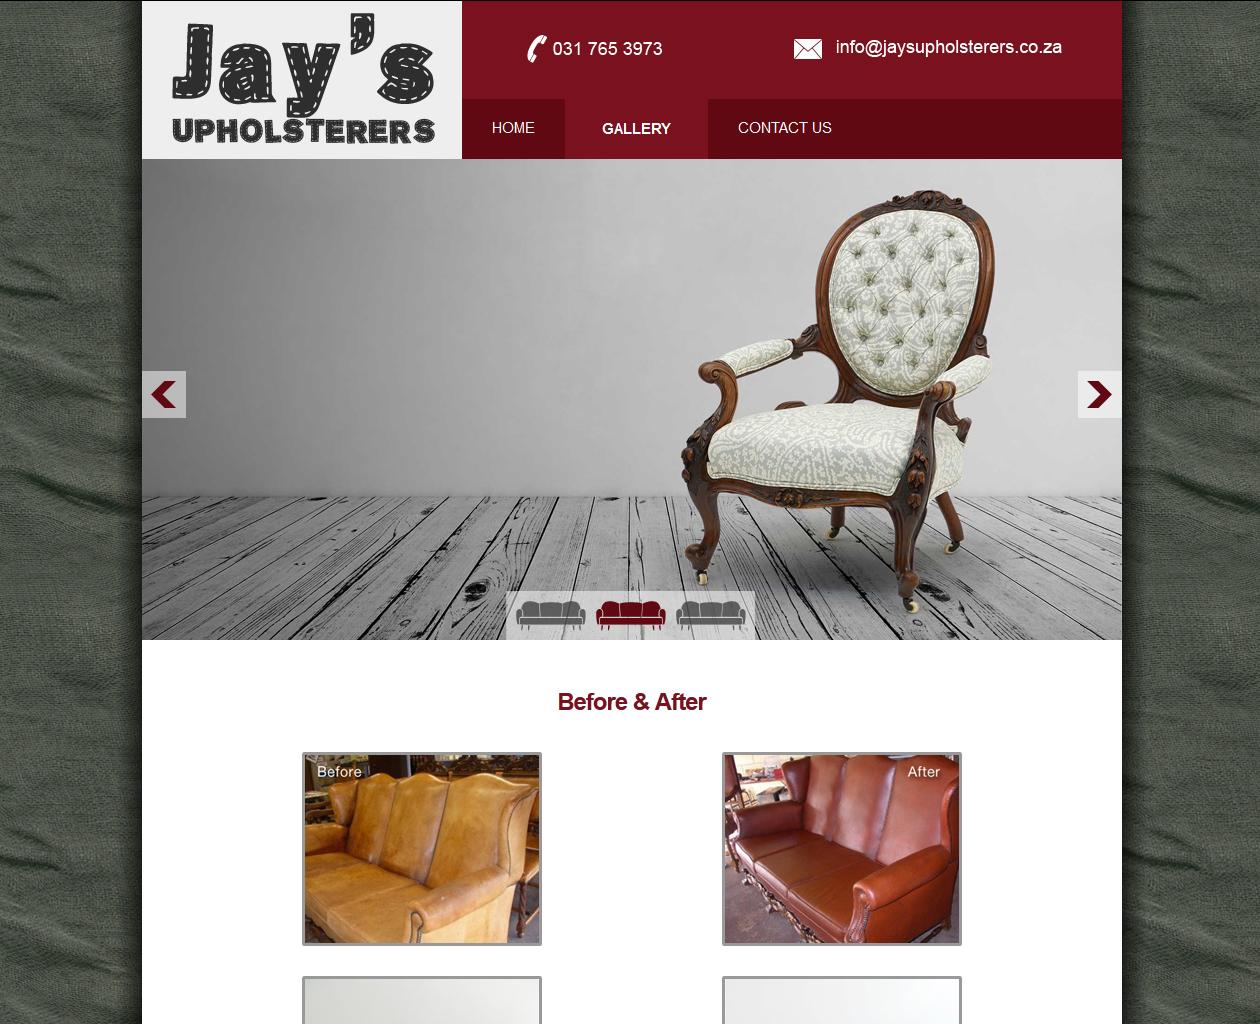 Jay's Upholsterers